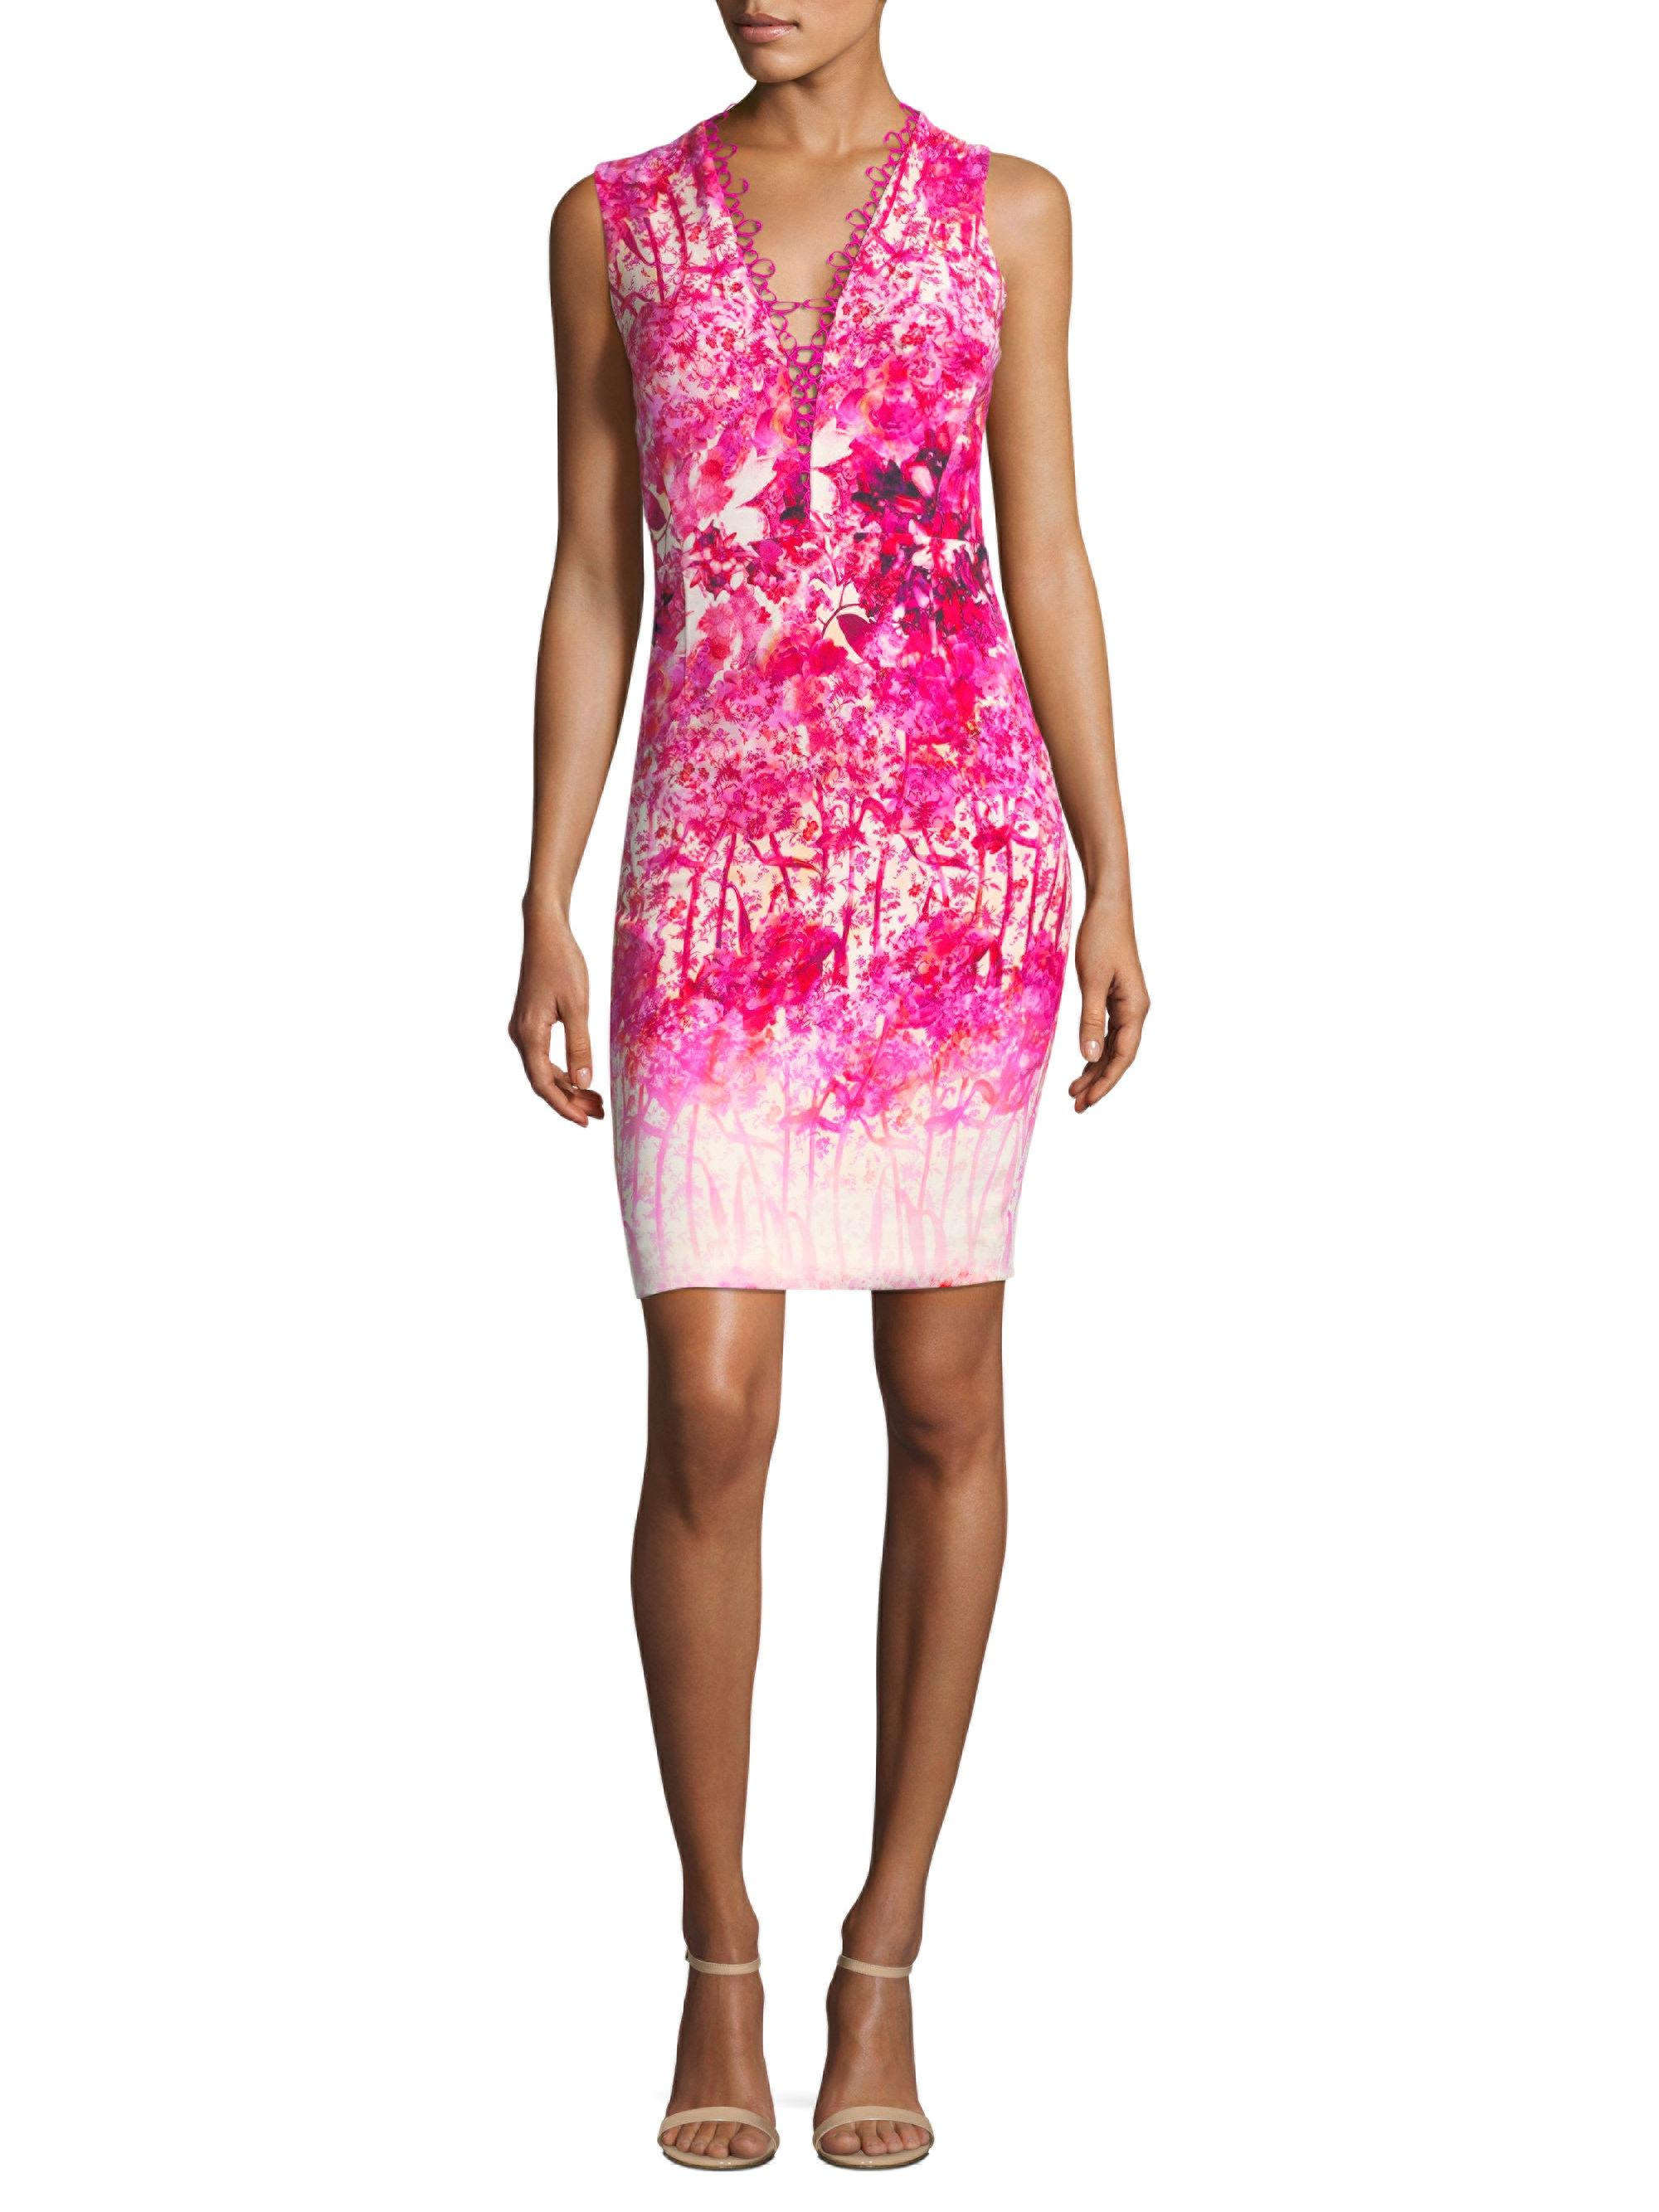 c176abc7fc409 Elie Tahari Floral Sheath Dress in Pink - Lyst